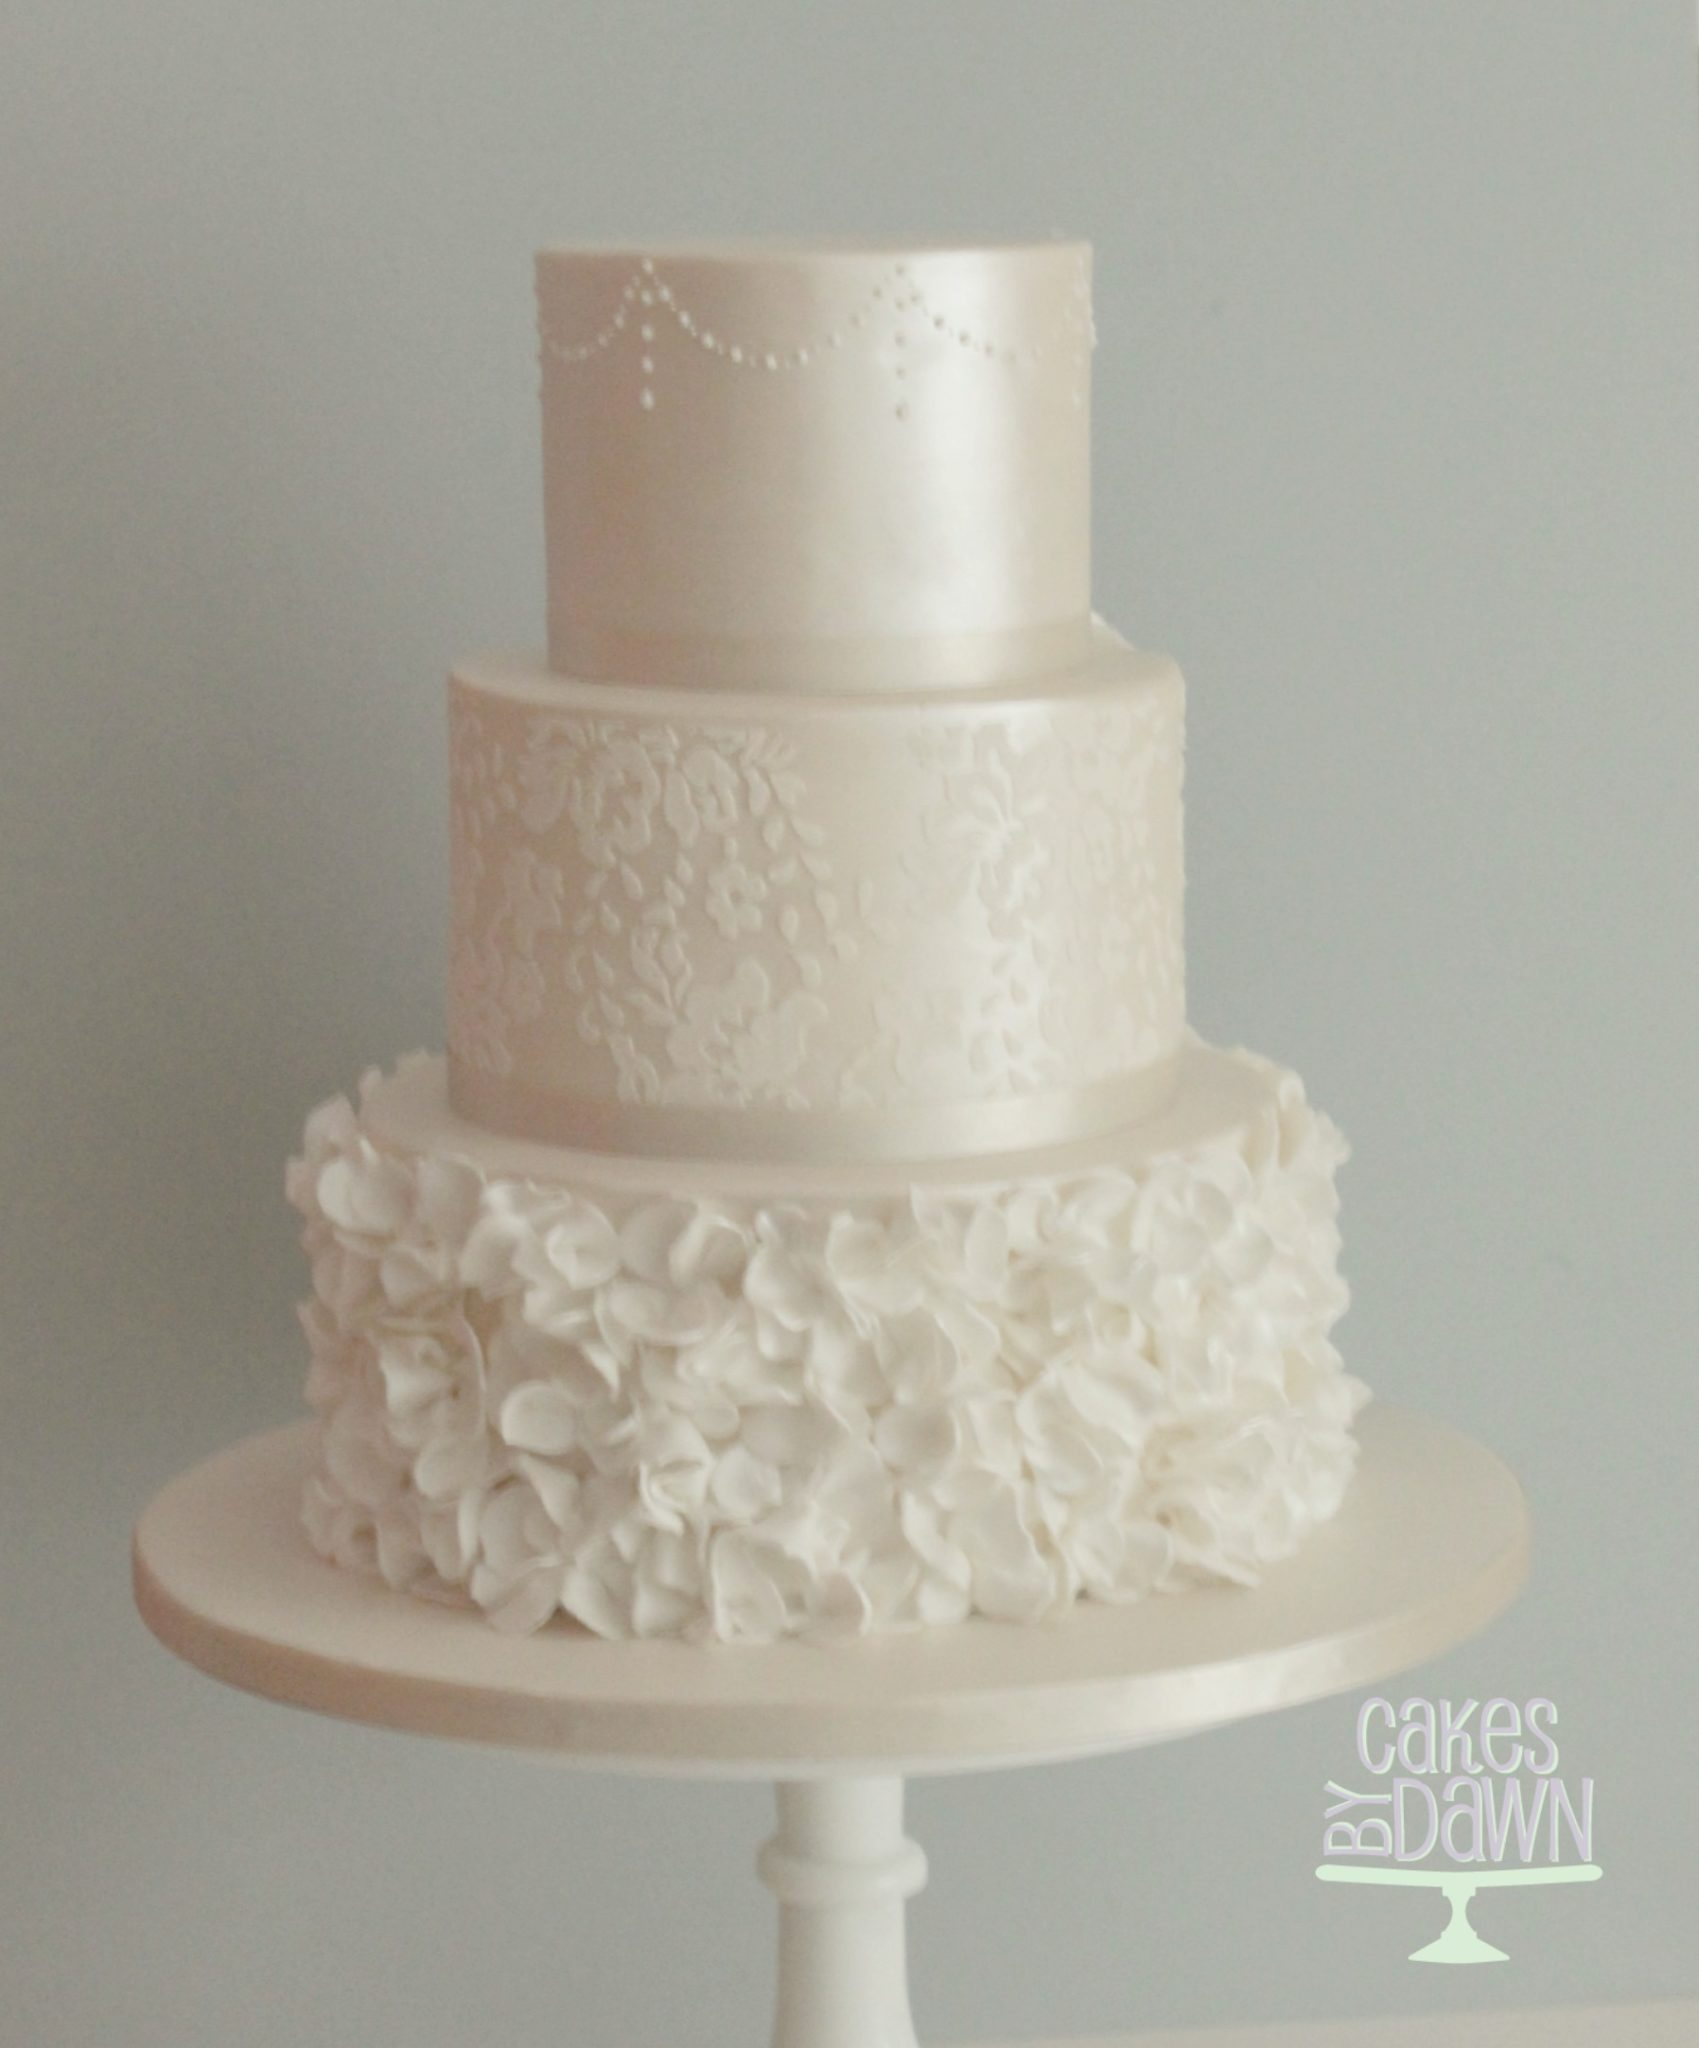 Sugarpaste Finish Wedding Cakes - Cakes By Dawn